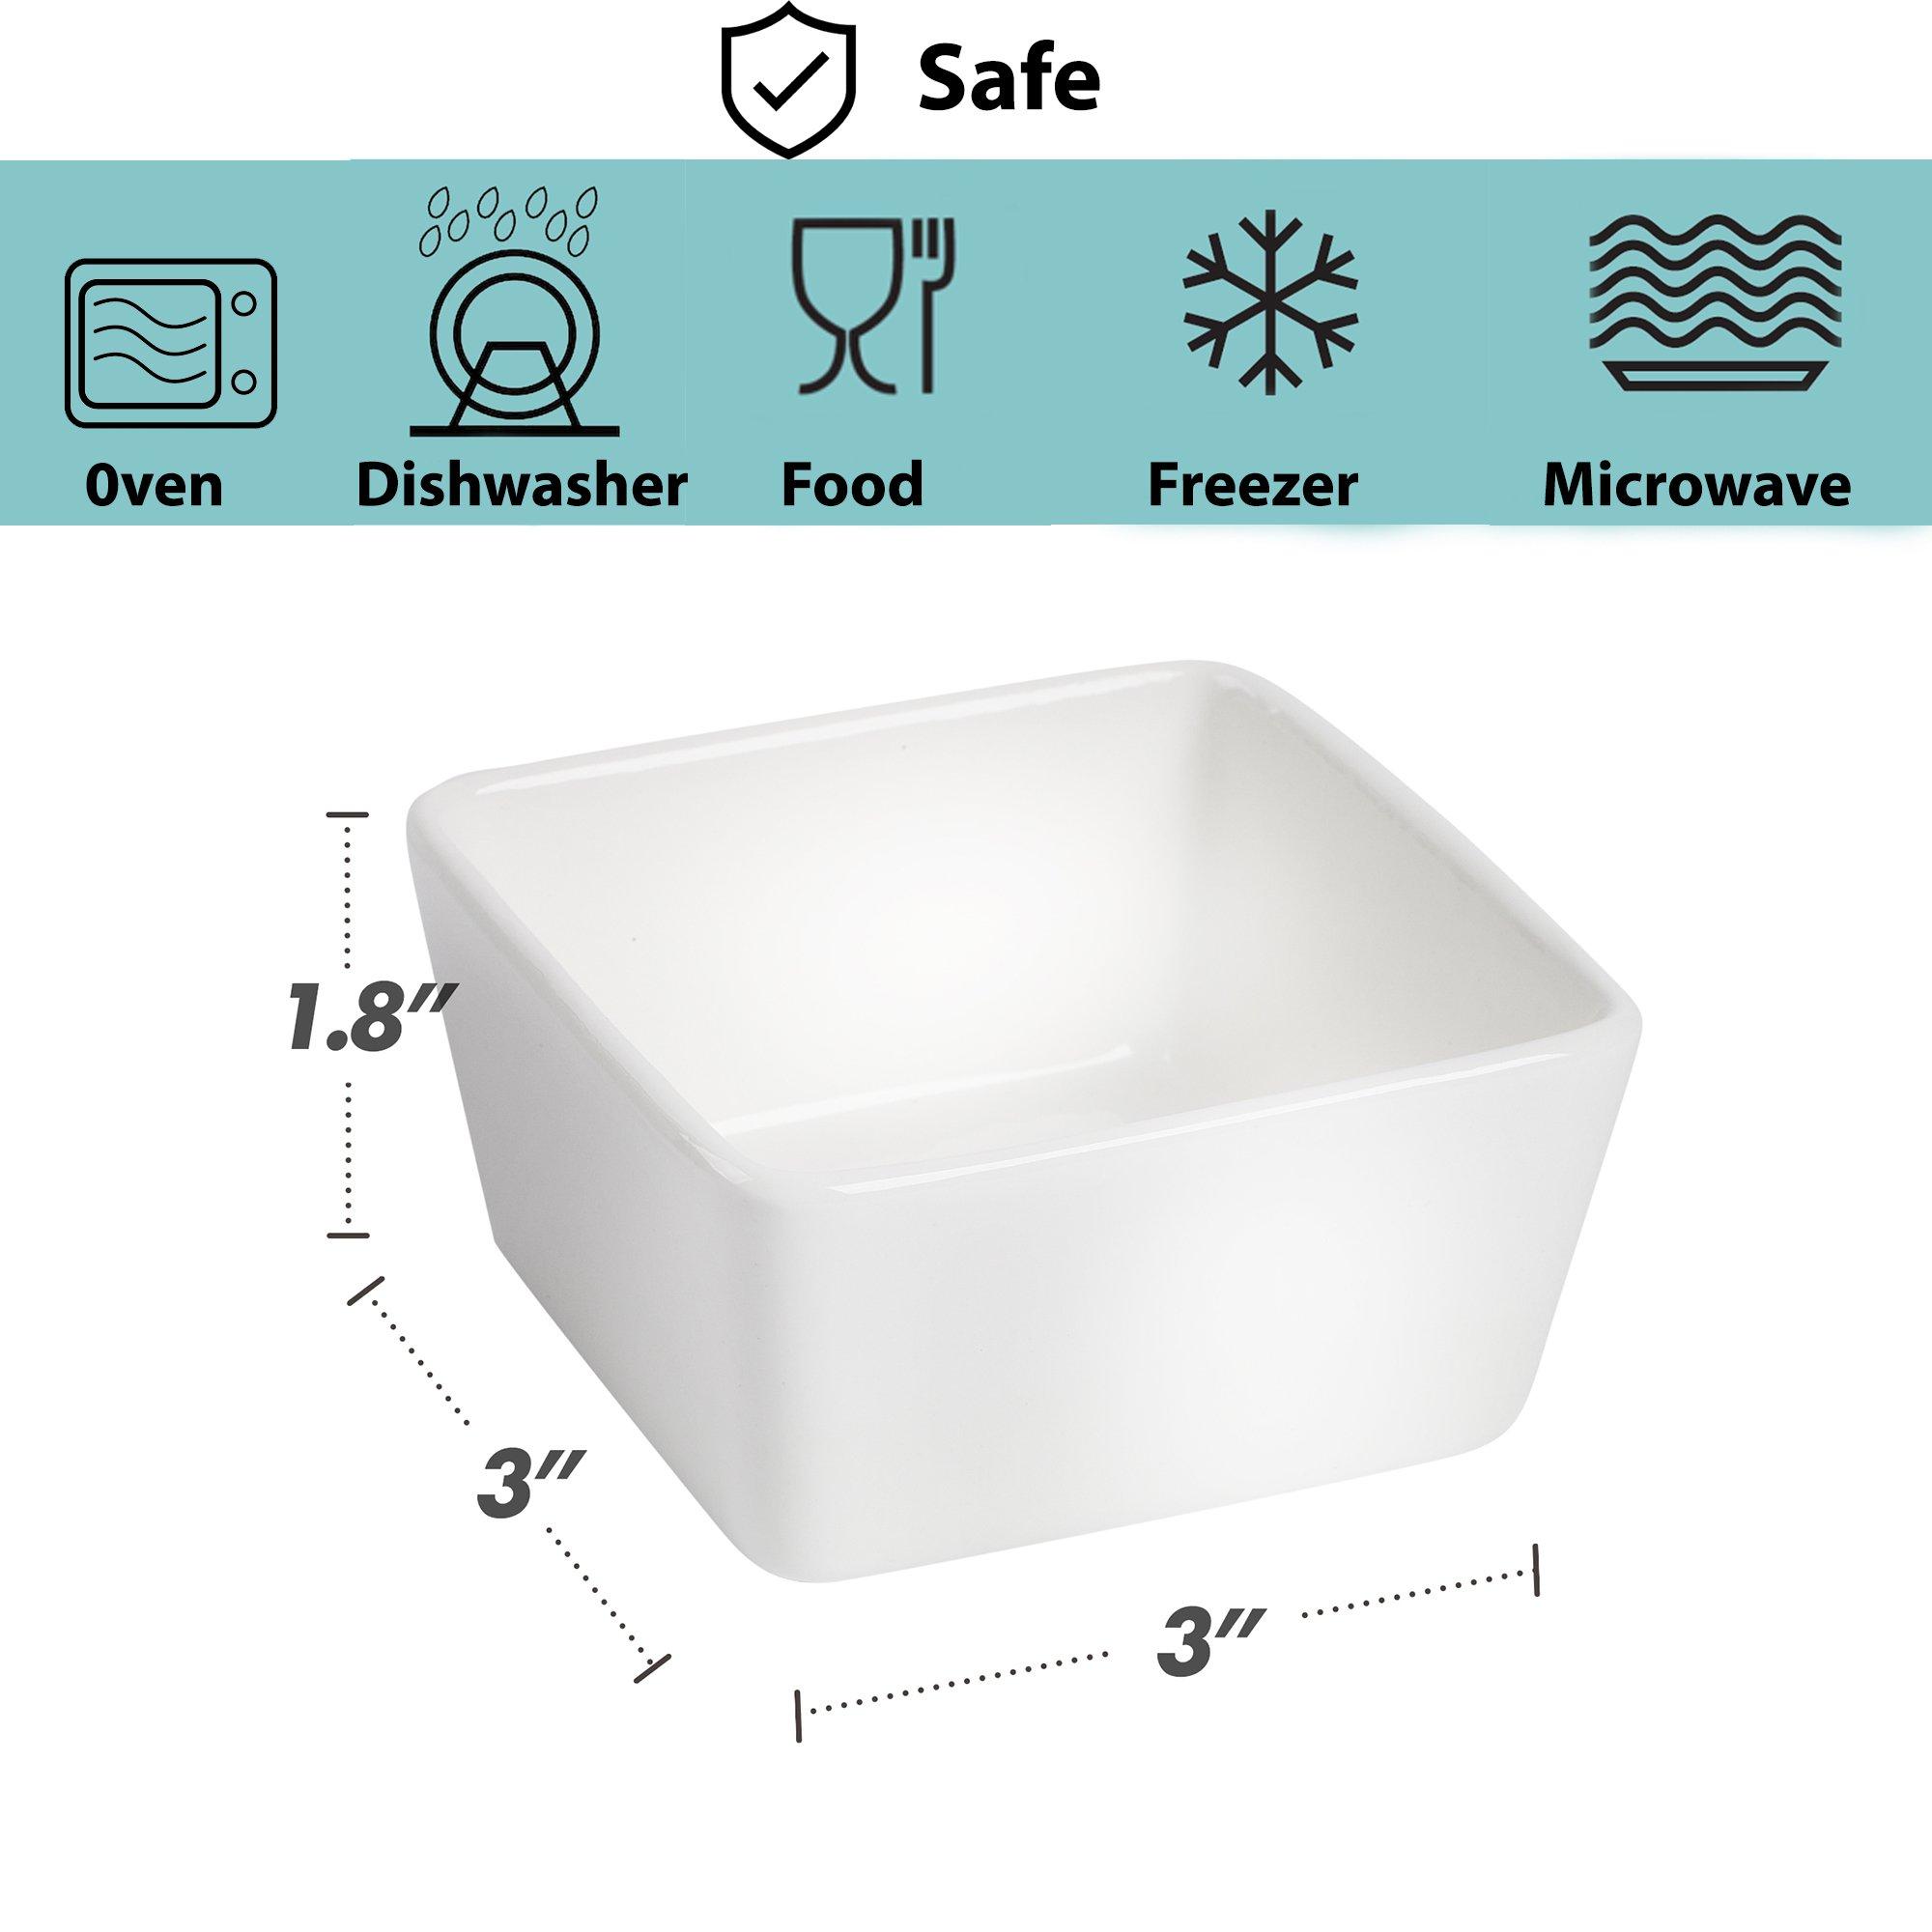 BTäT - Ramekins 8 oz - Set of 8 Square, Porcelain Ramekins, Ramekins for Baking, Creme Brulee Dish, Souffle Cups, Appetizer Cups, Custard Dish, Pudding cups, Ramiken Set, Dipping Bowl. by Brew To A Tea (Image #4)